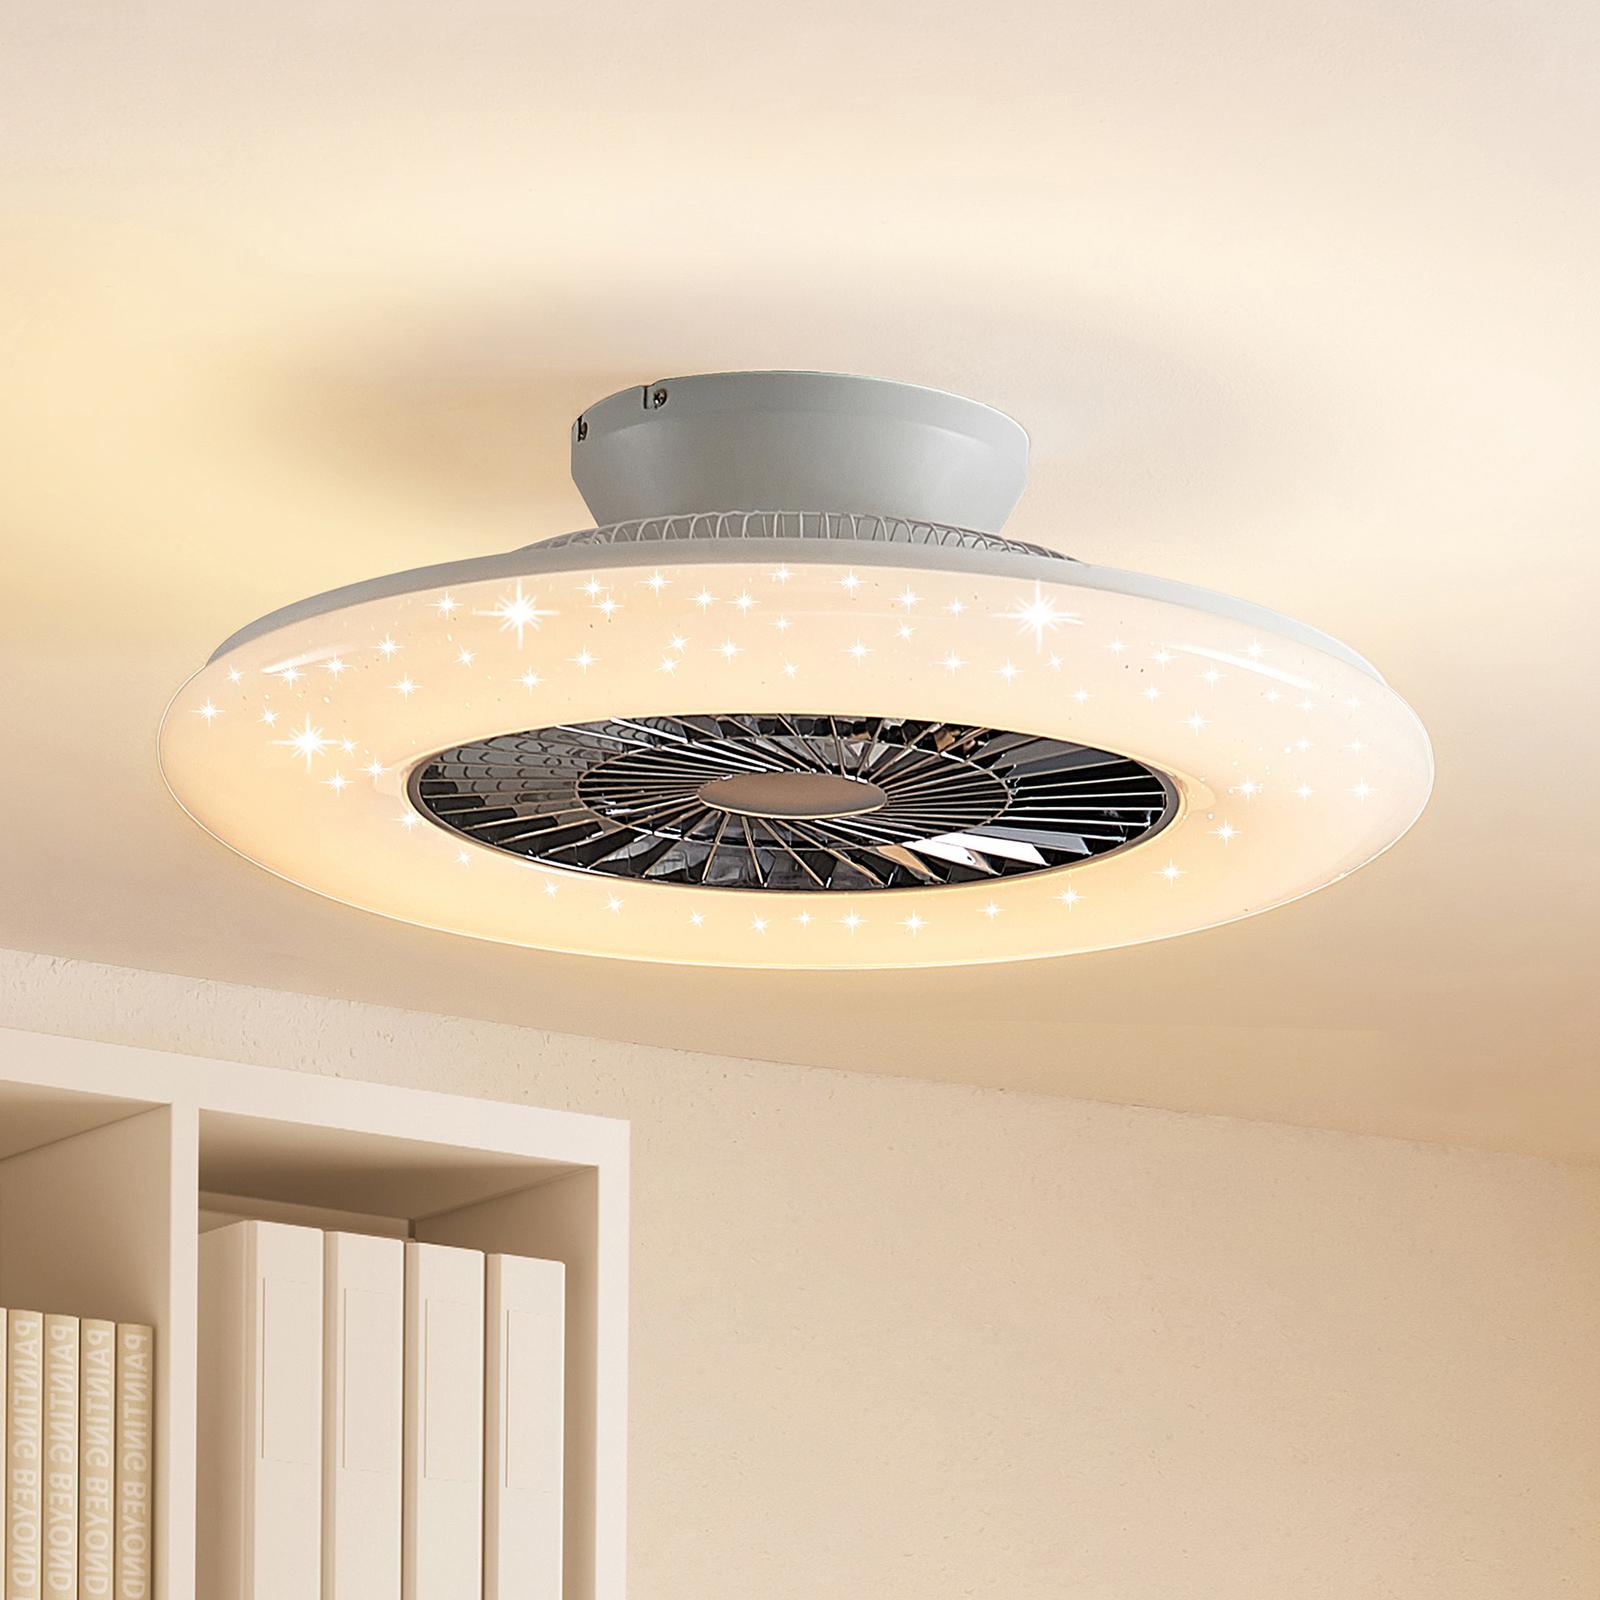 Lindby Madino LED plafondventilator m. verlichting